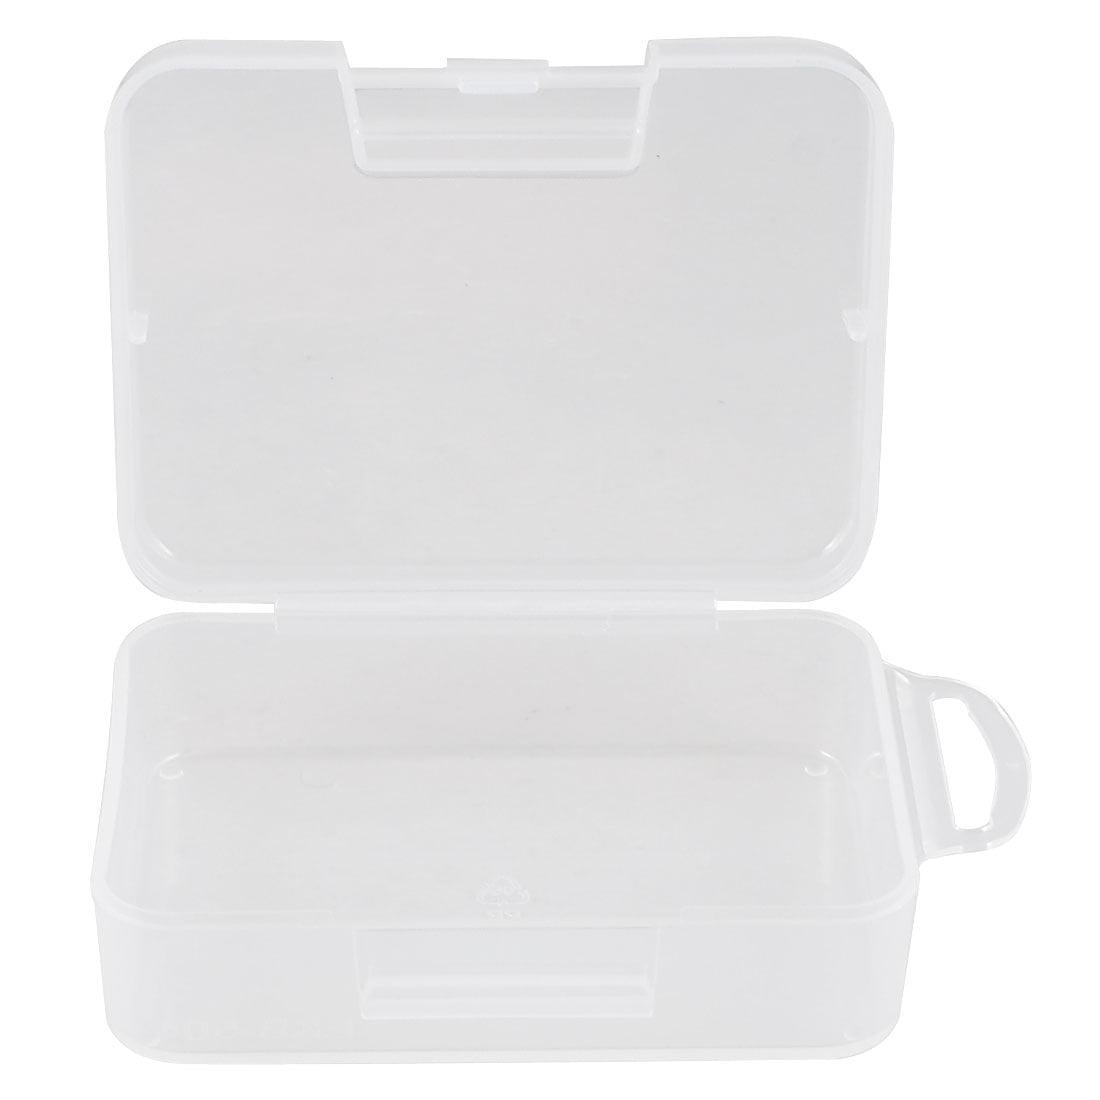 Unique Bargains Clear Plastic Jewelry Cuboid Case Box Holder Container 9cm x 6.5cm x 3cm